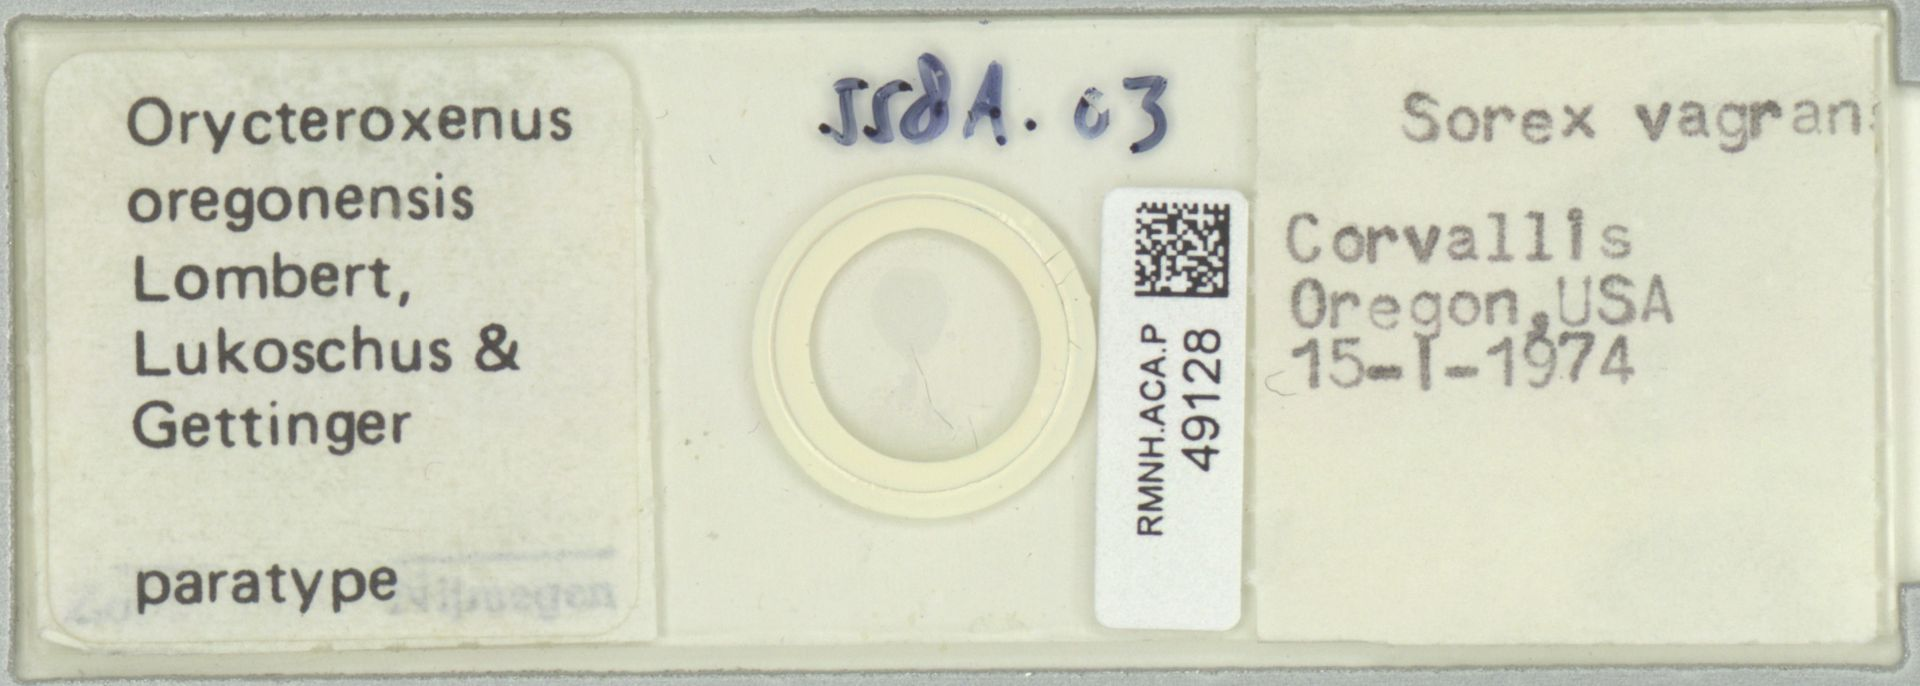 RMNH.ACA.P.49128   Orycteroxenus oregonensis Lombert, Lukoschus & Gettinger